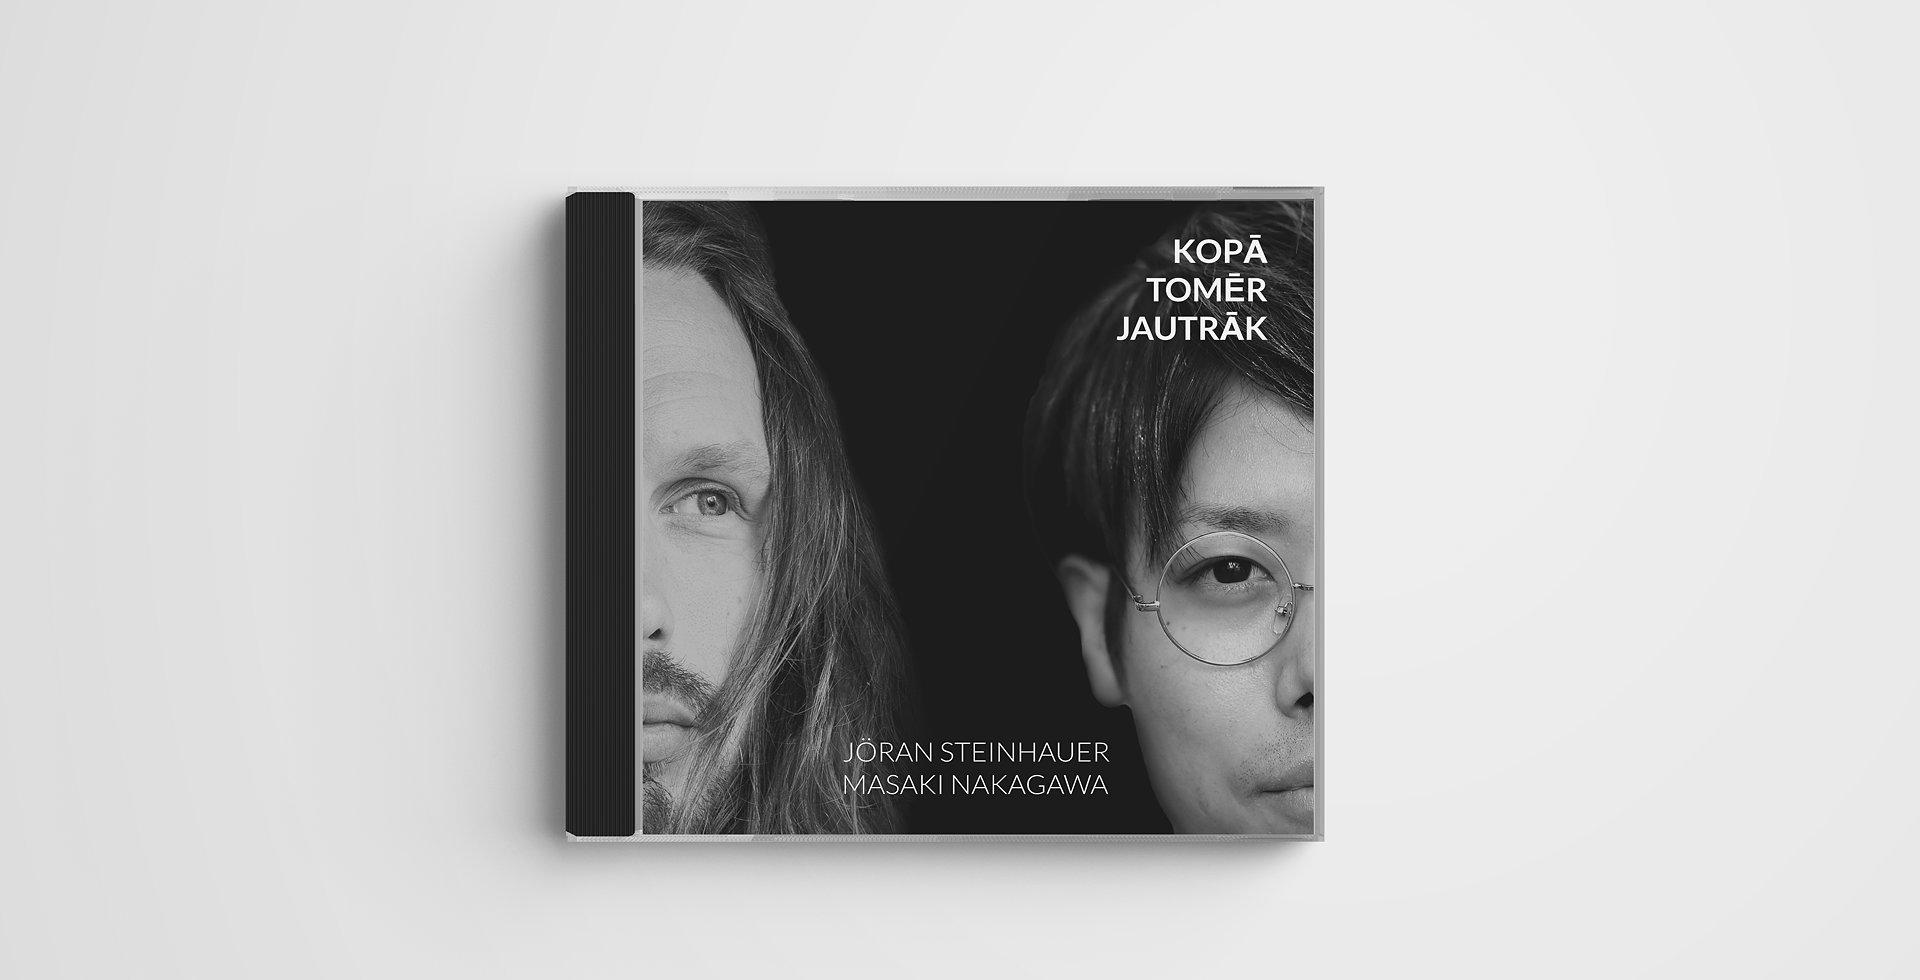 http://CD-Cover